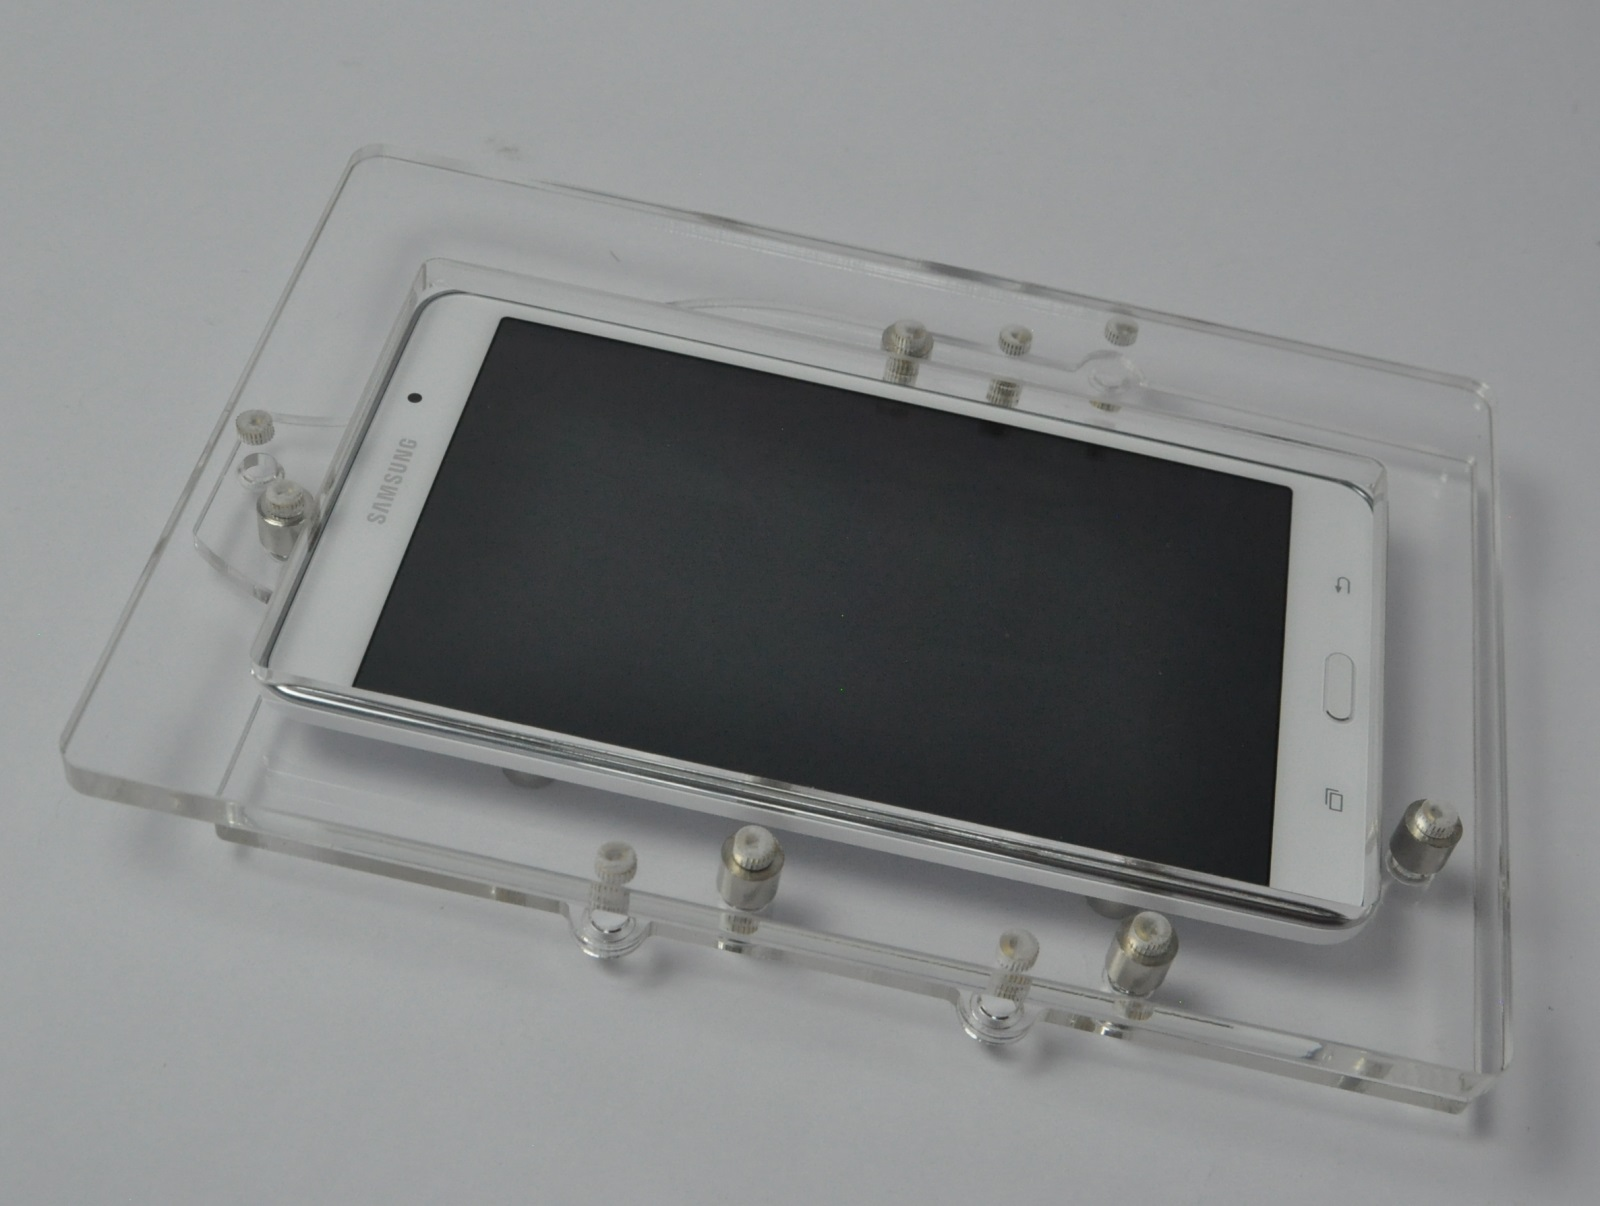 Samsung Galaxy Tab 3 7 0 Clear Acrylic Security Enclosure